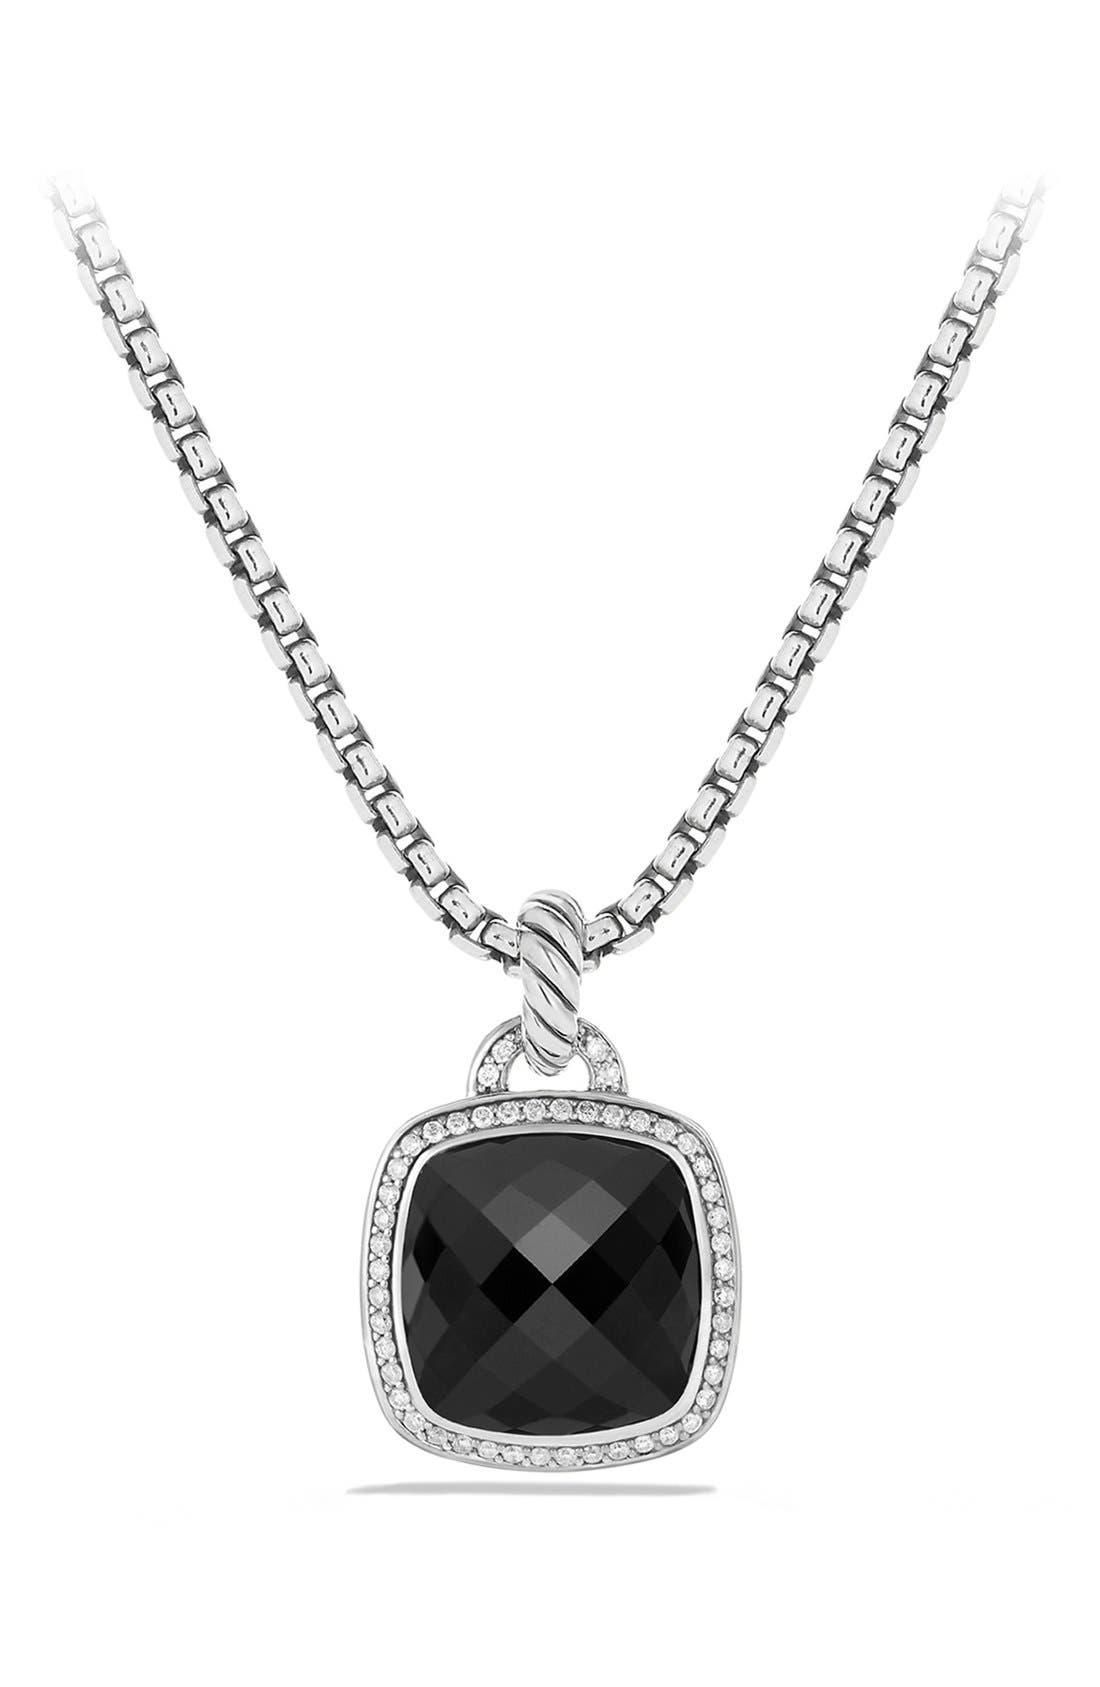 DAVID YURMAN Albion Pendant with Semiprecious Stone and Diamonds